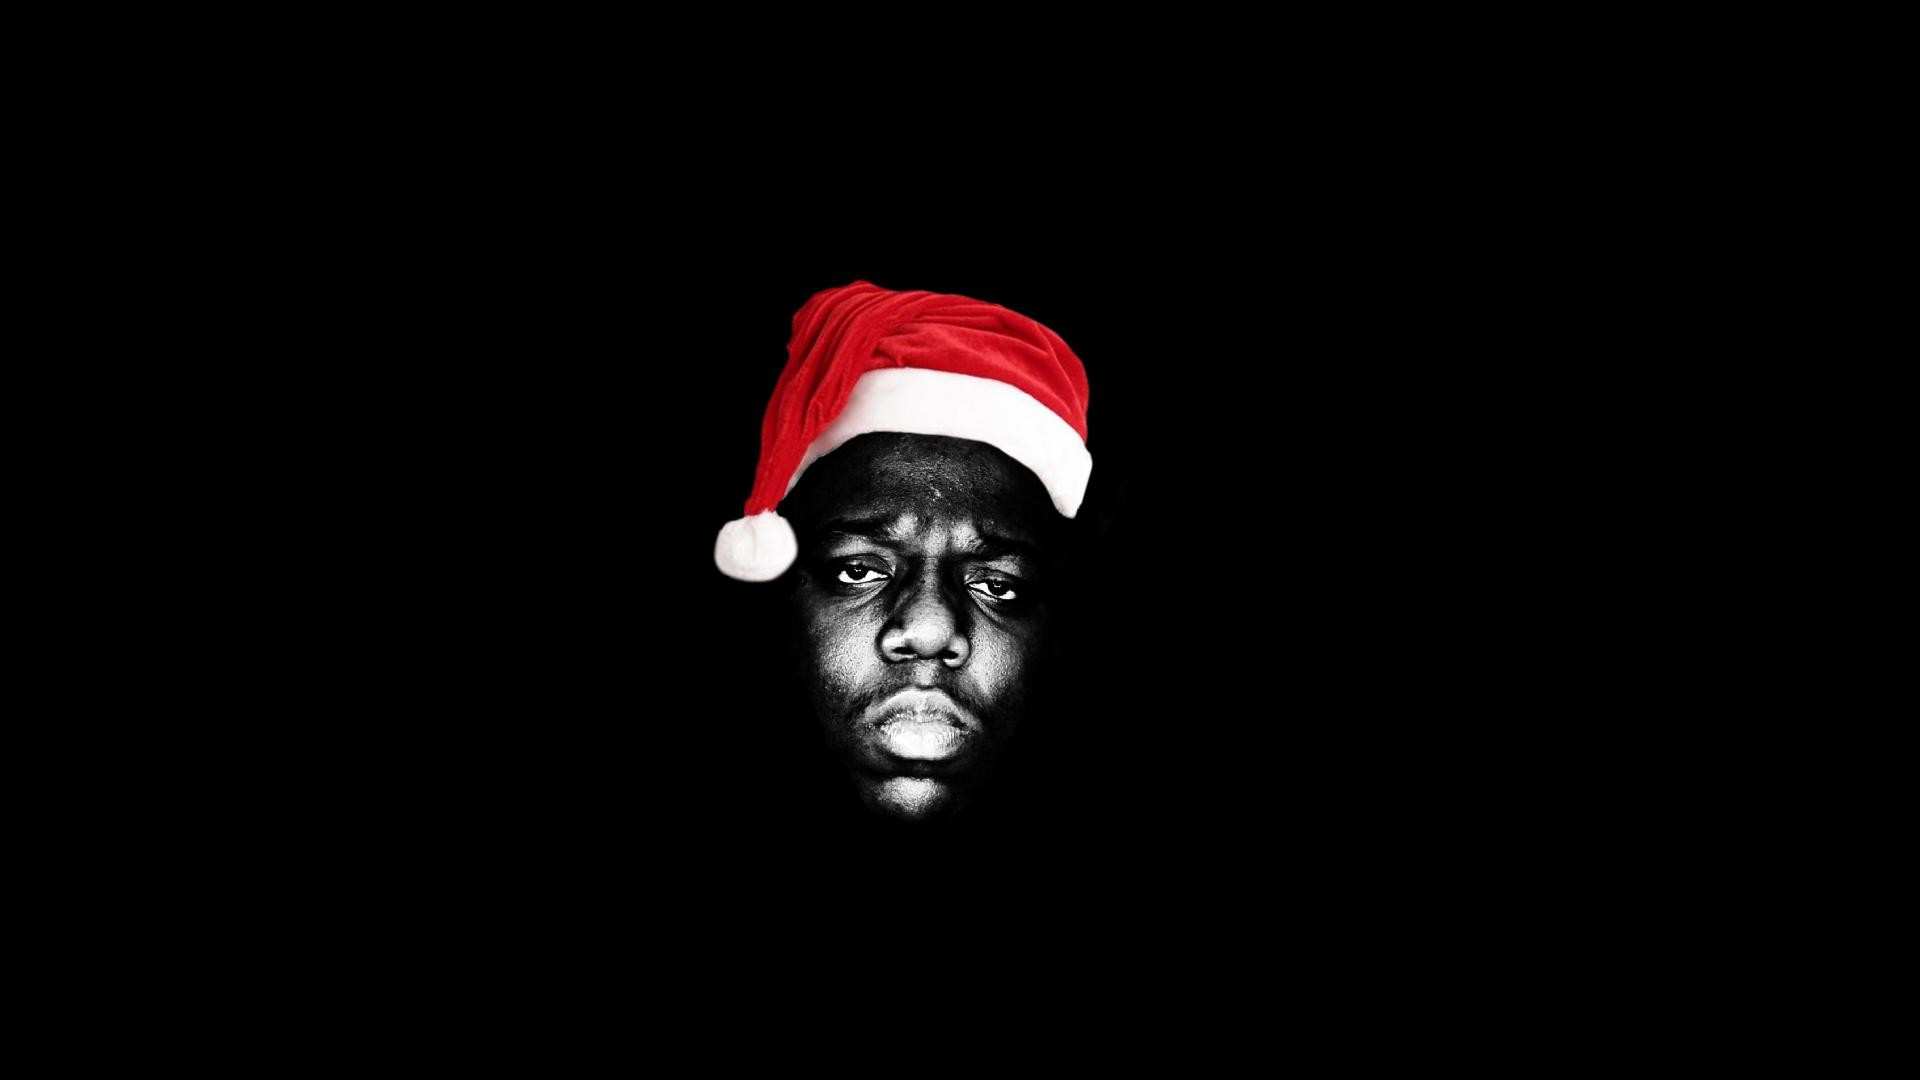 Christmas Biggie [1920×1080] (x-post /r/HipHopWallpapers) …